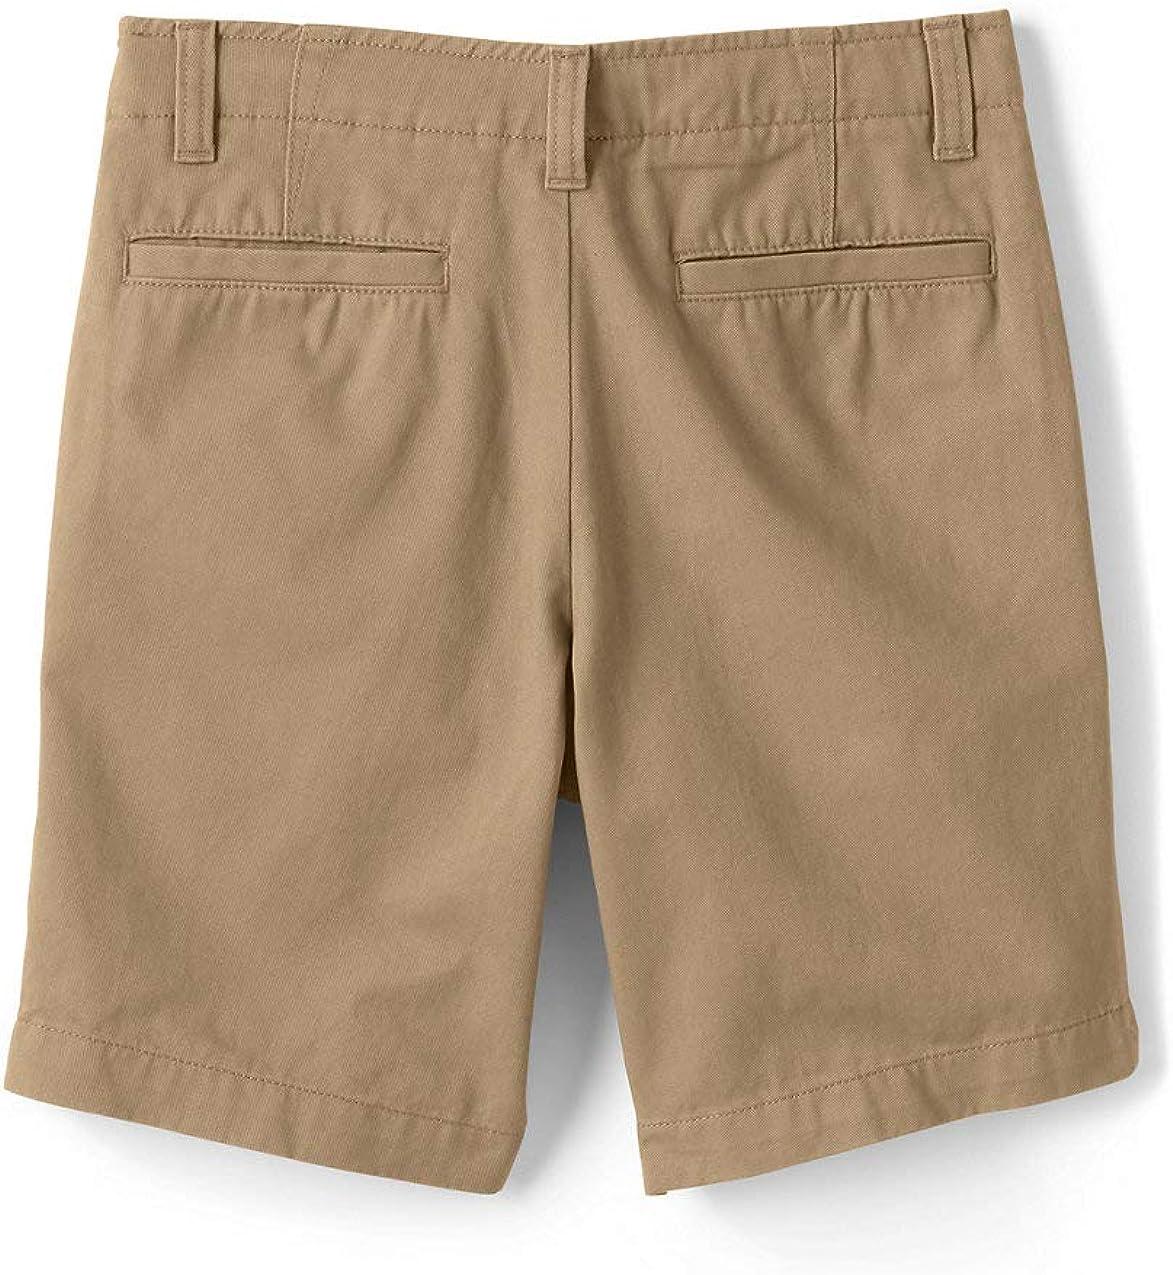 Lands End Boys Cadet Shorts Cadet Gray Big Slim 10